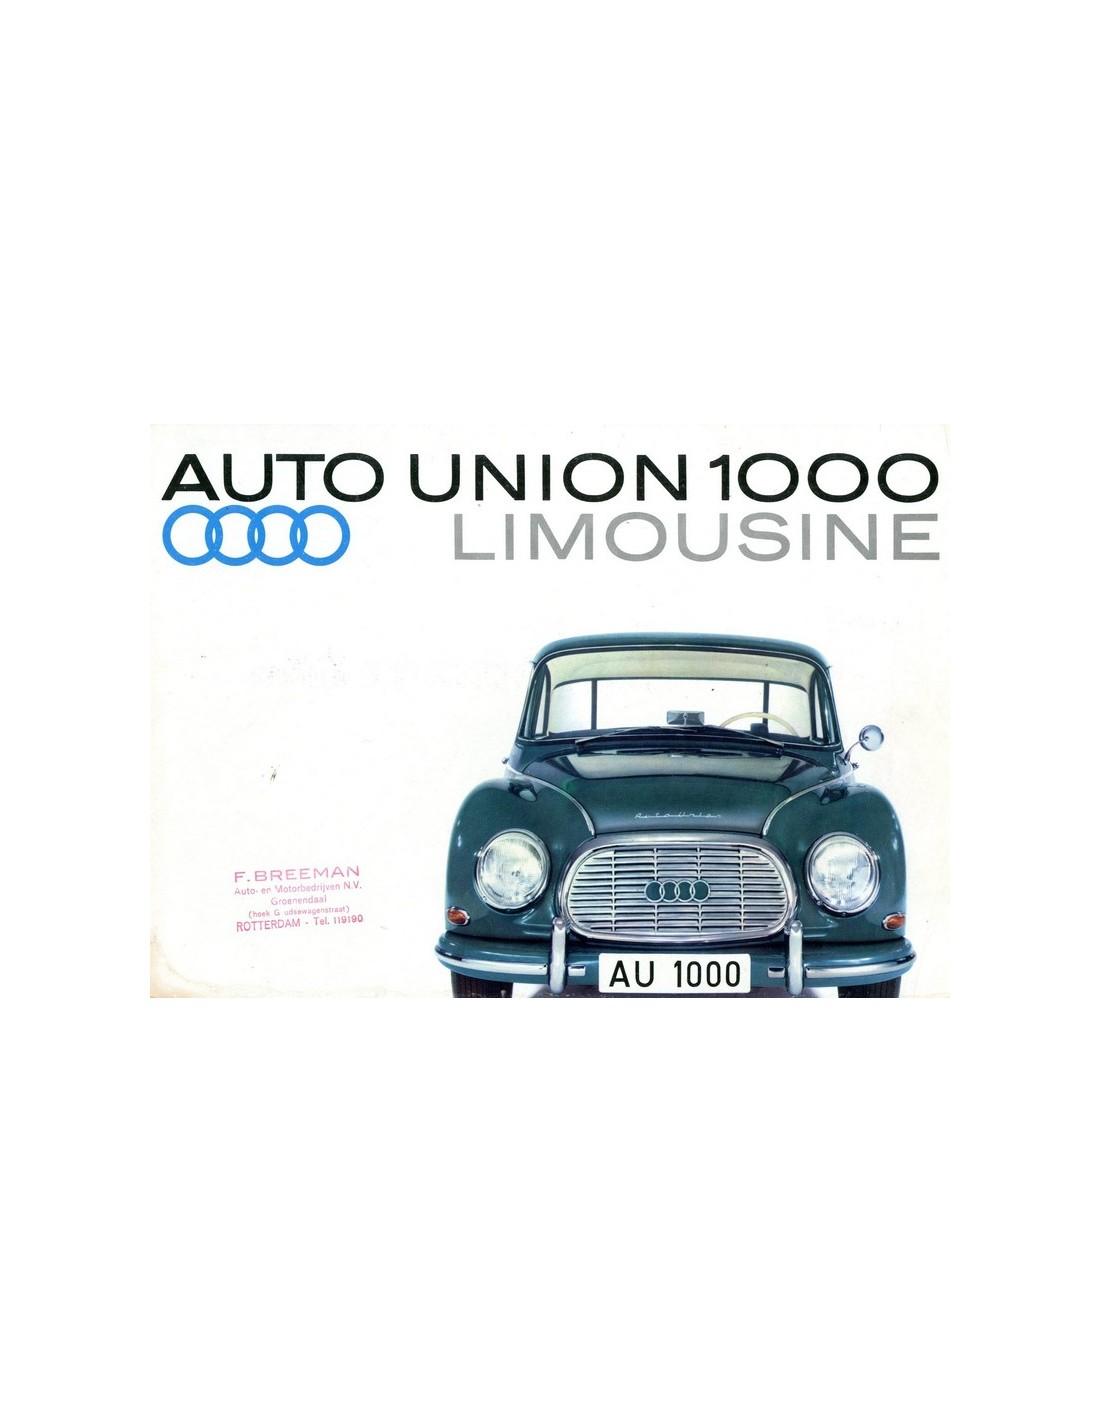 Bmw Z3 Brochure: 1962 DKW 1000 BROCHURE GERMAN